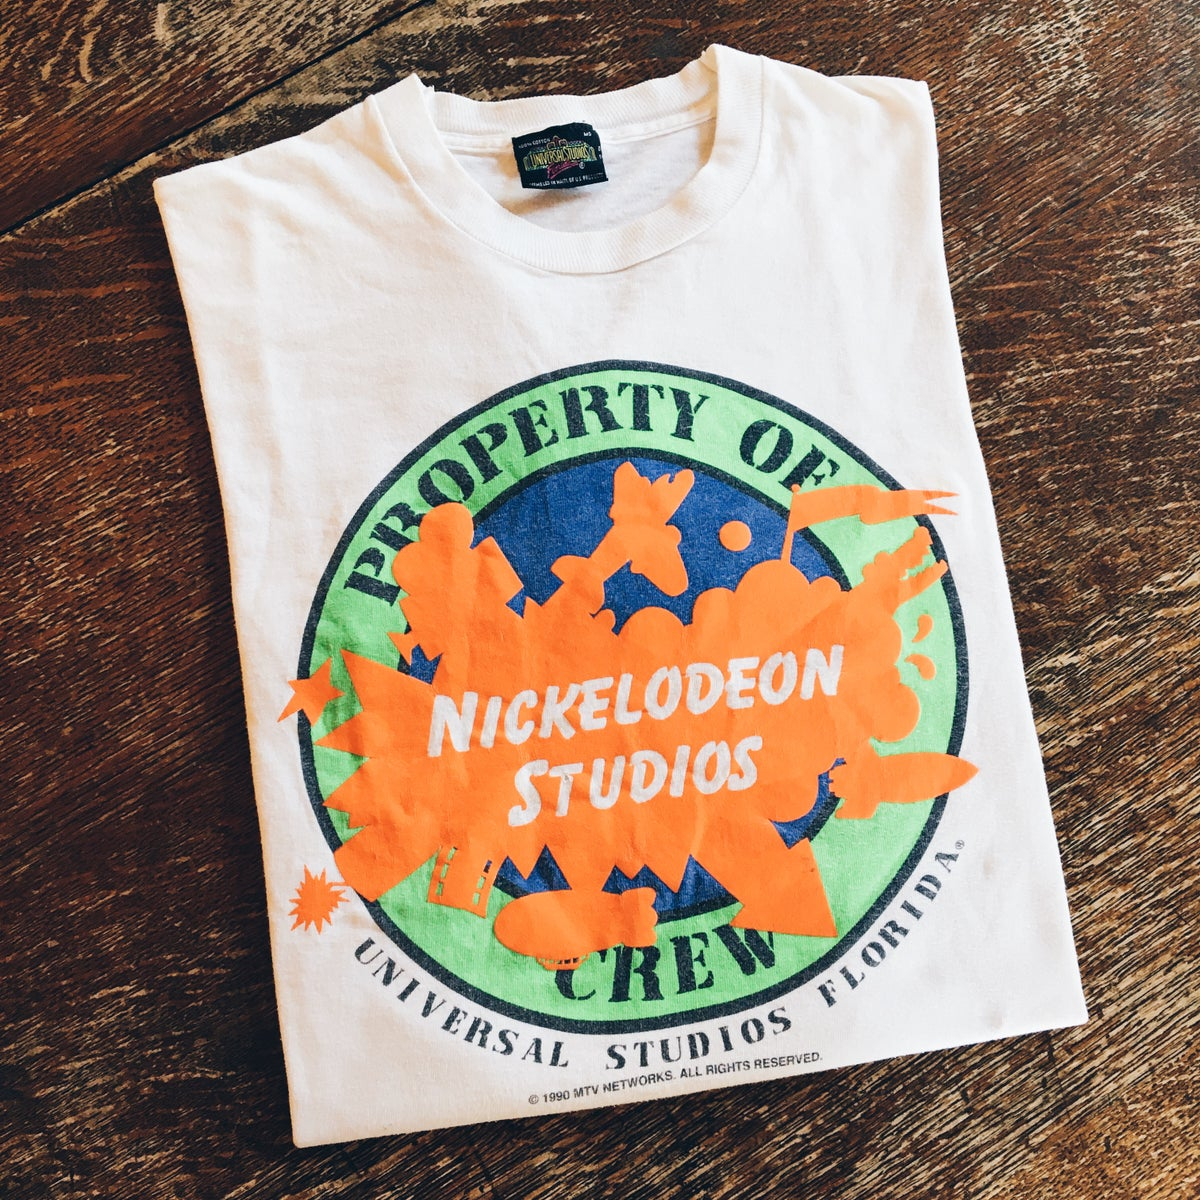 Image of Original 1990 MTV Nickelodeon Studios Tee.